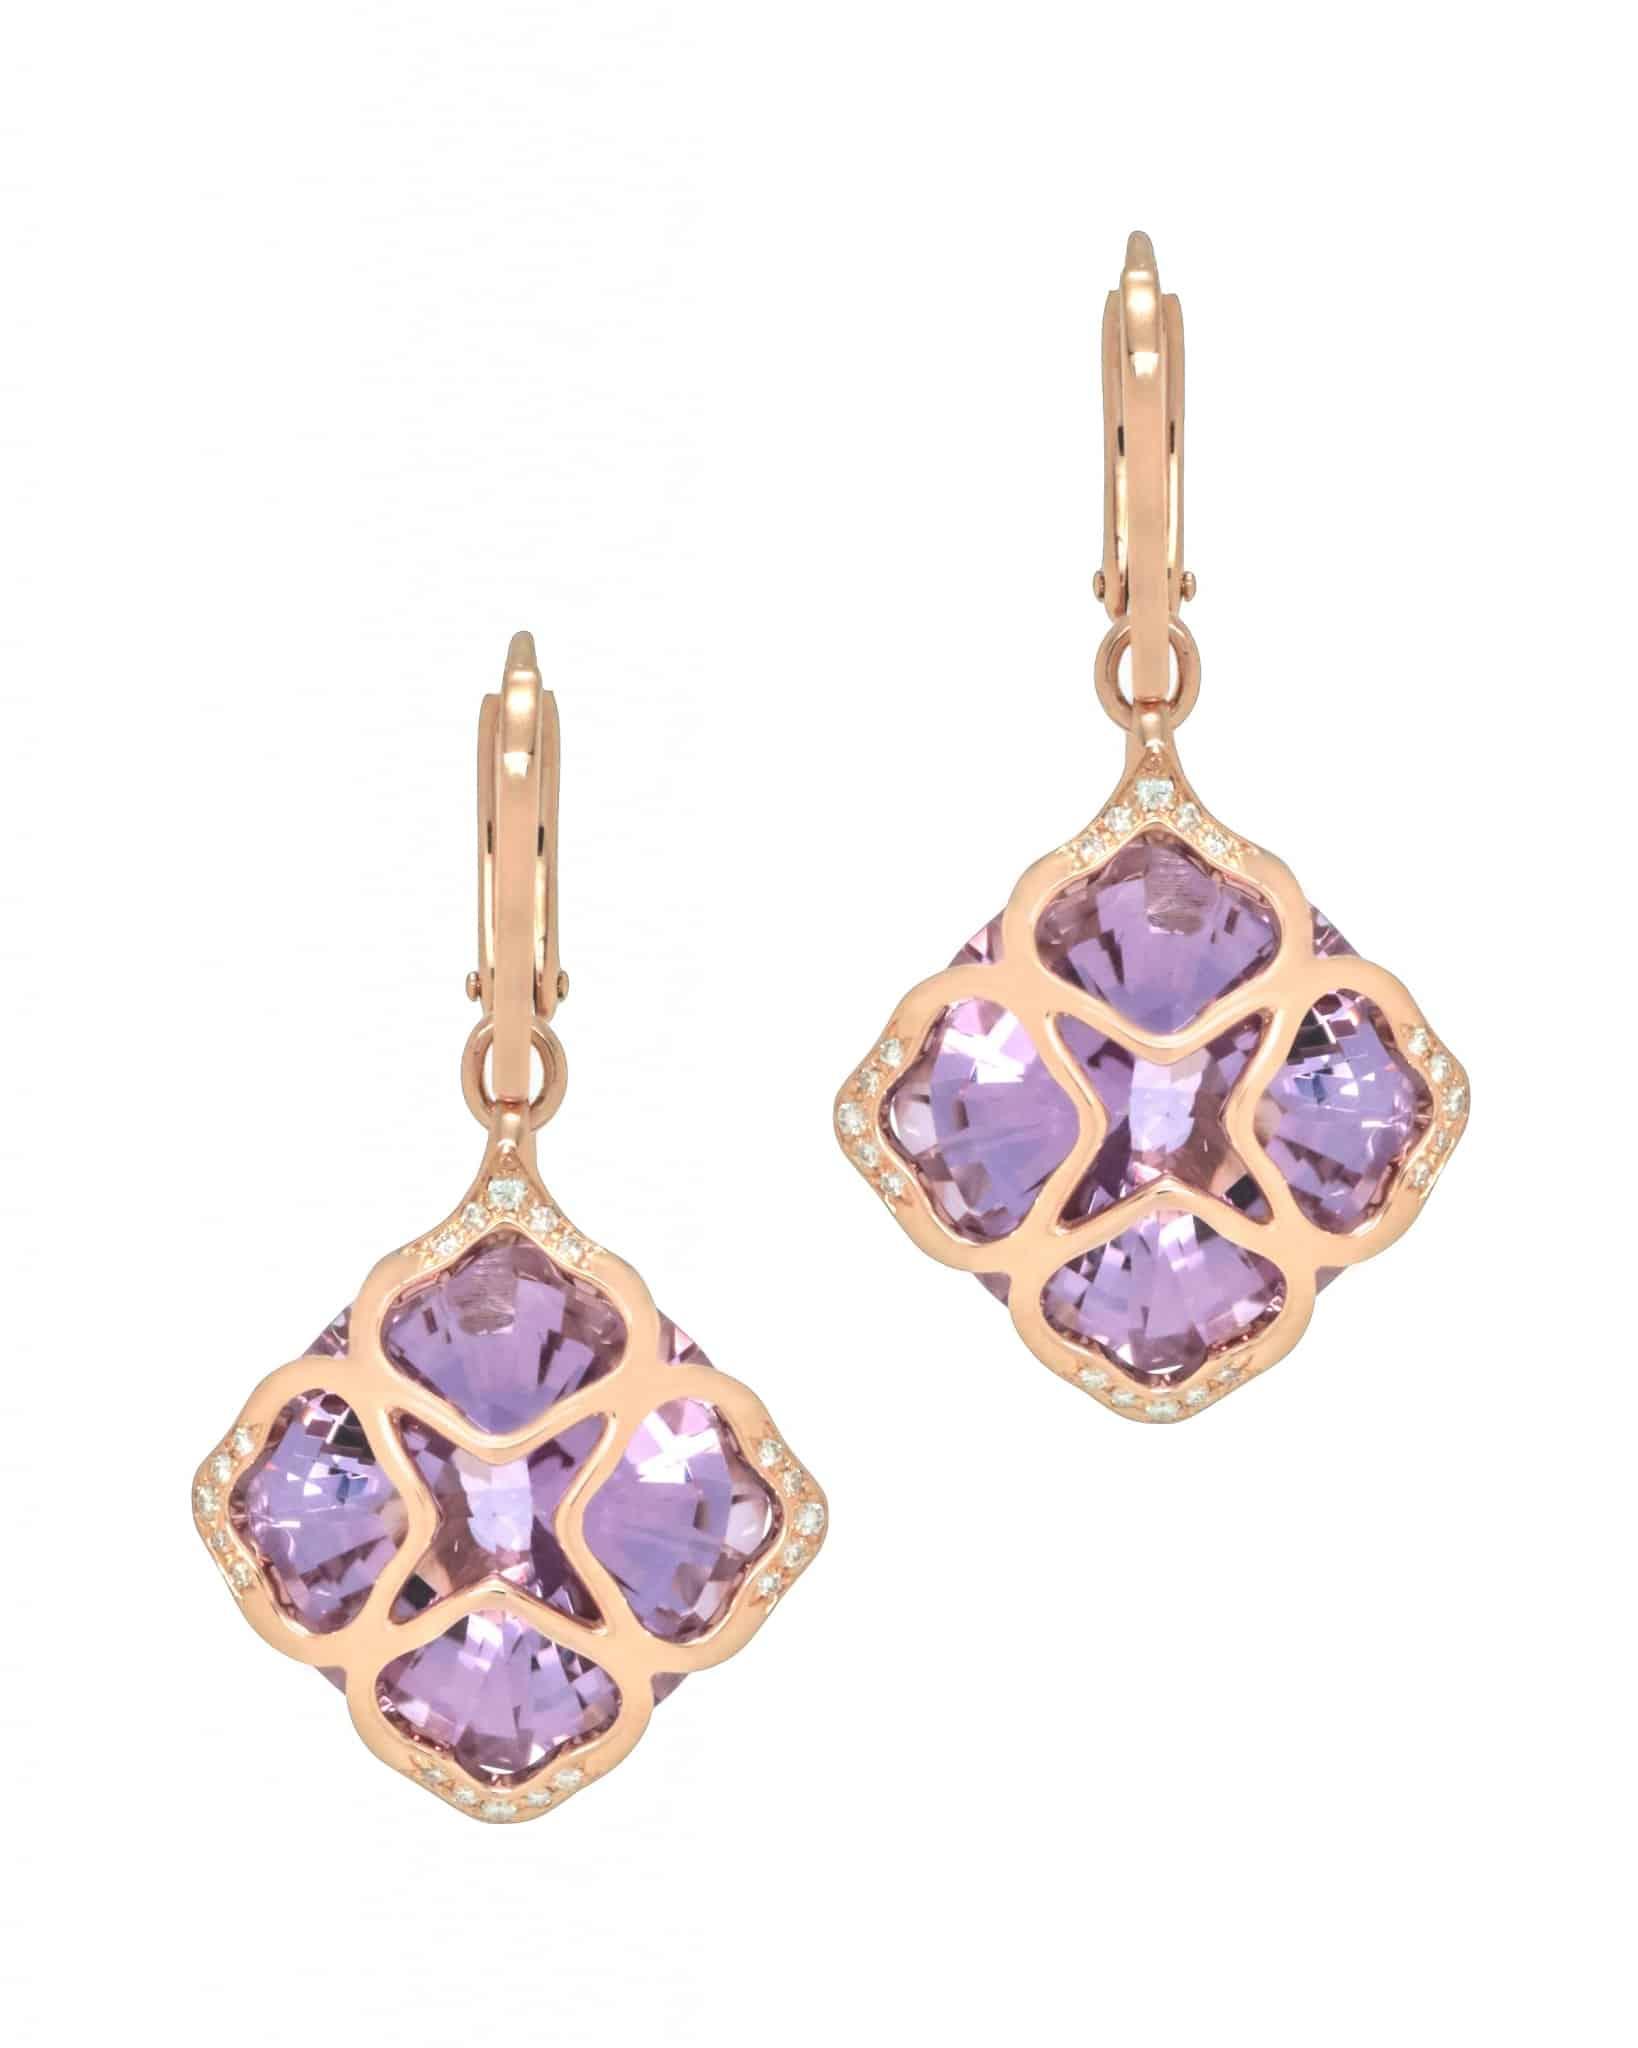 Chopard 18K Rose Gold, Purple Amethysts And Diamond Earrings 8395635001 MSRP $7,330